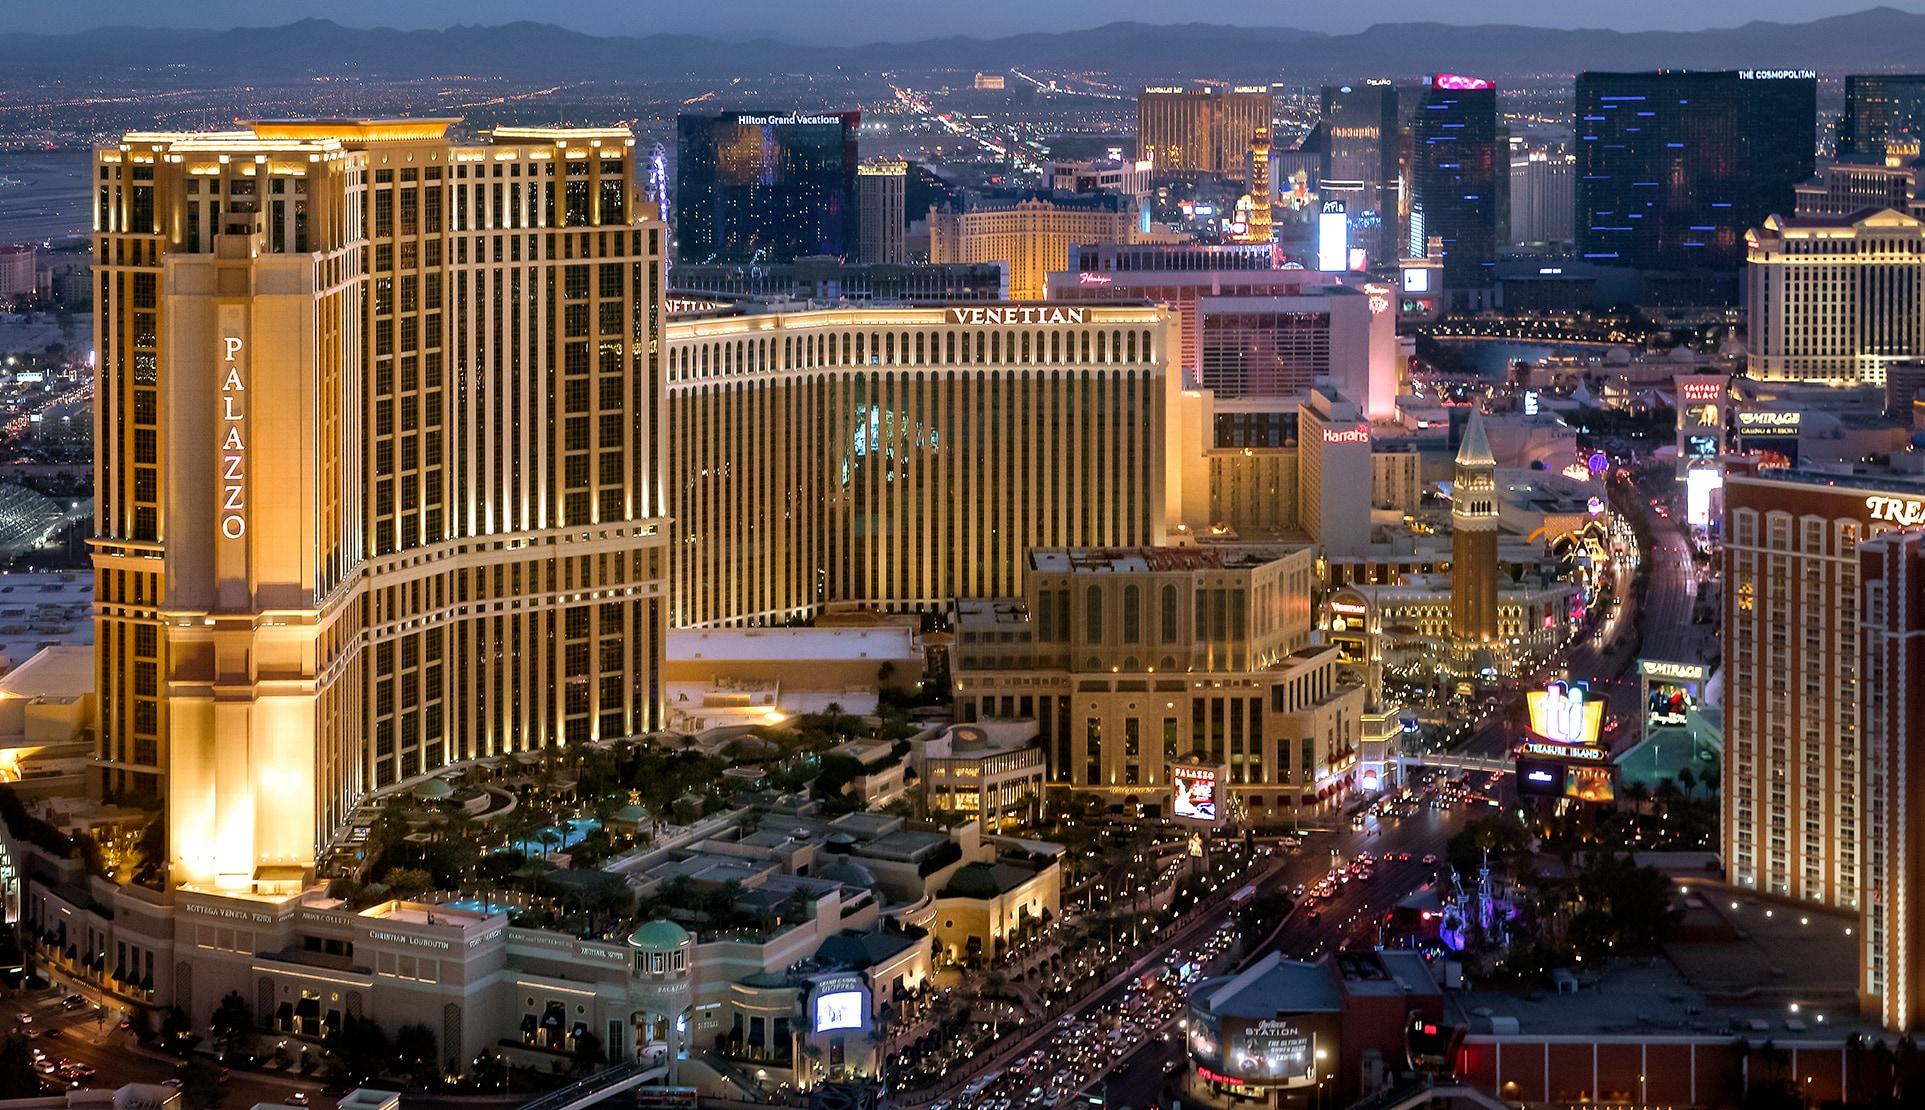 The Venetian Las Vegas